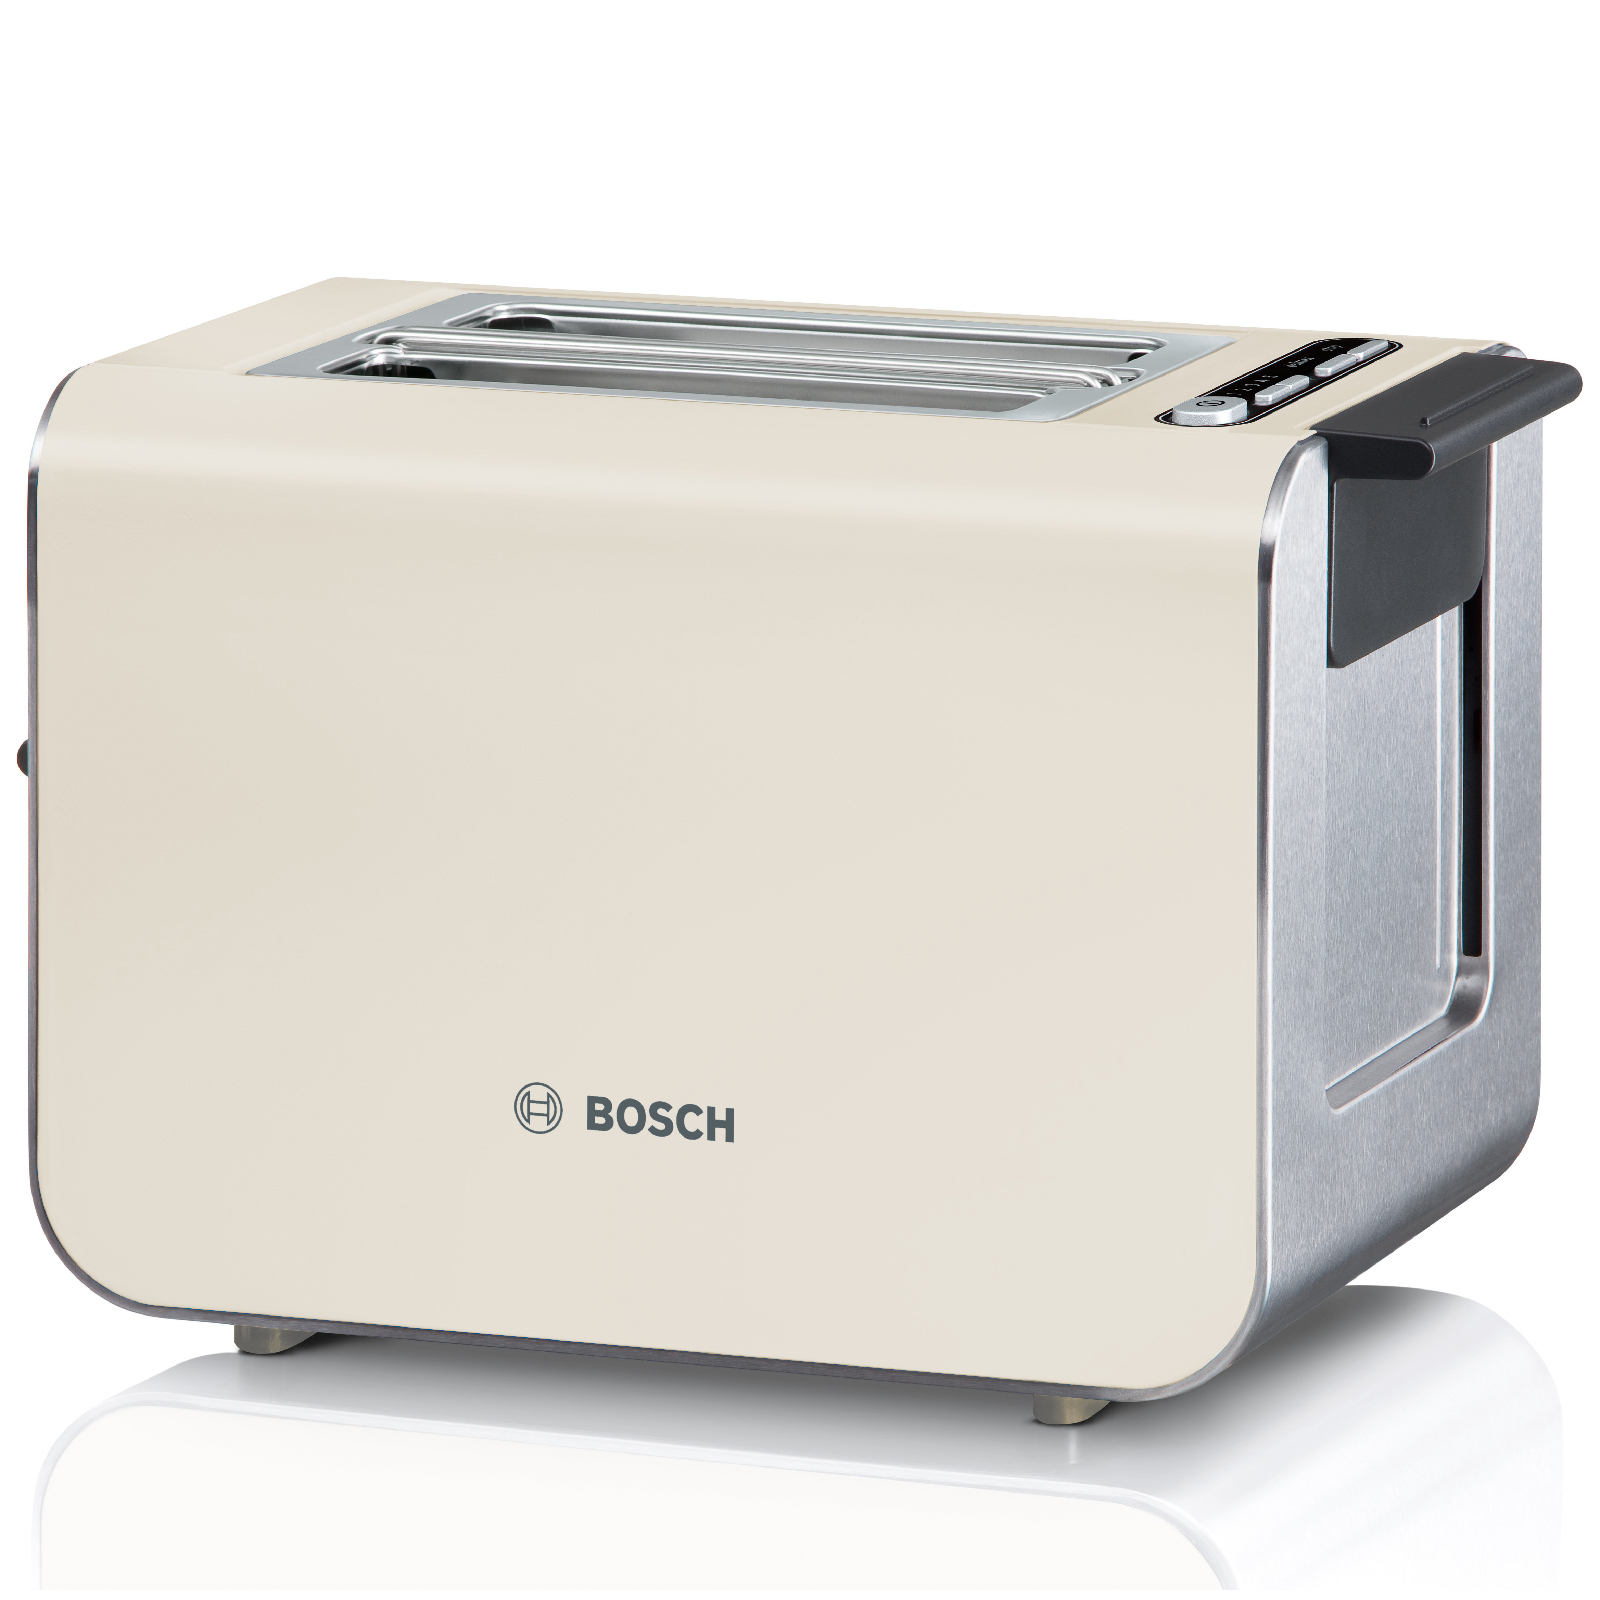 Bosch Tat8617gb Cream Styline 2 Slice Toaster Iwoot